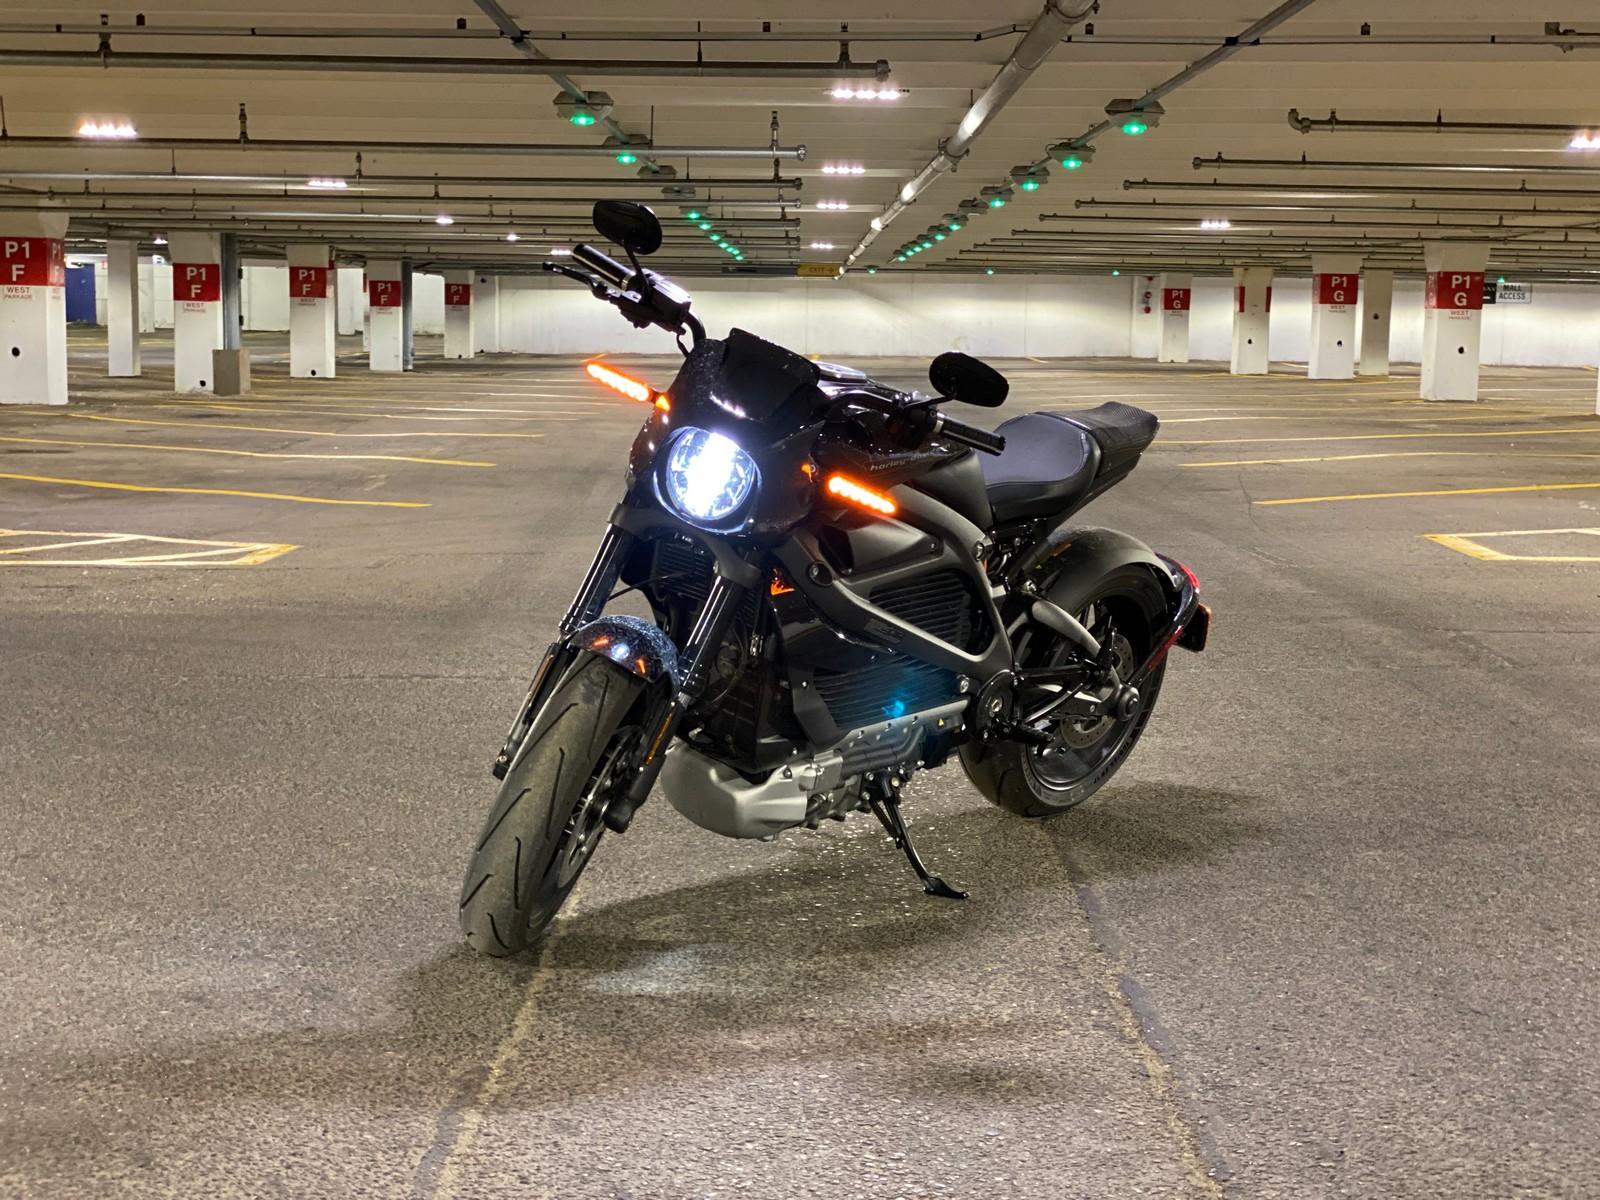 The Harley Davidson LiveWire LED headlight & turn signals